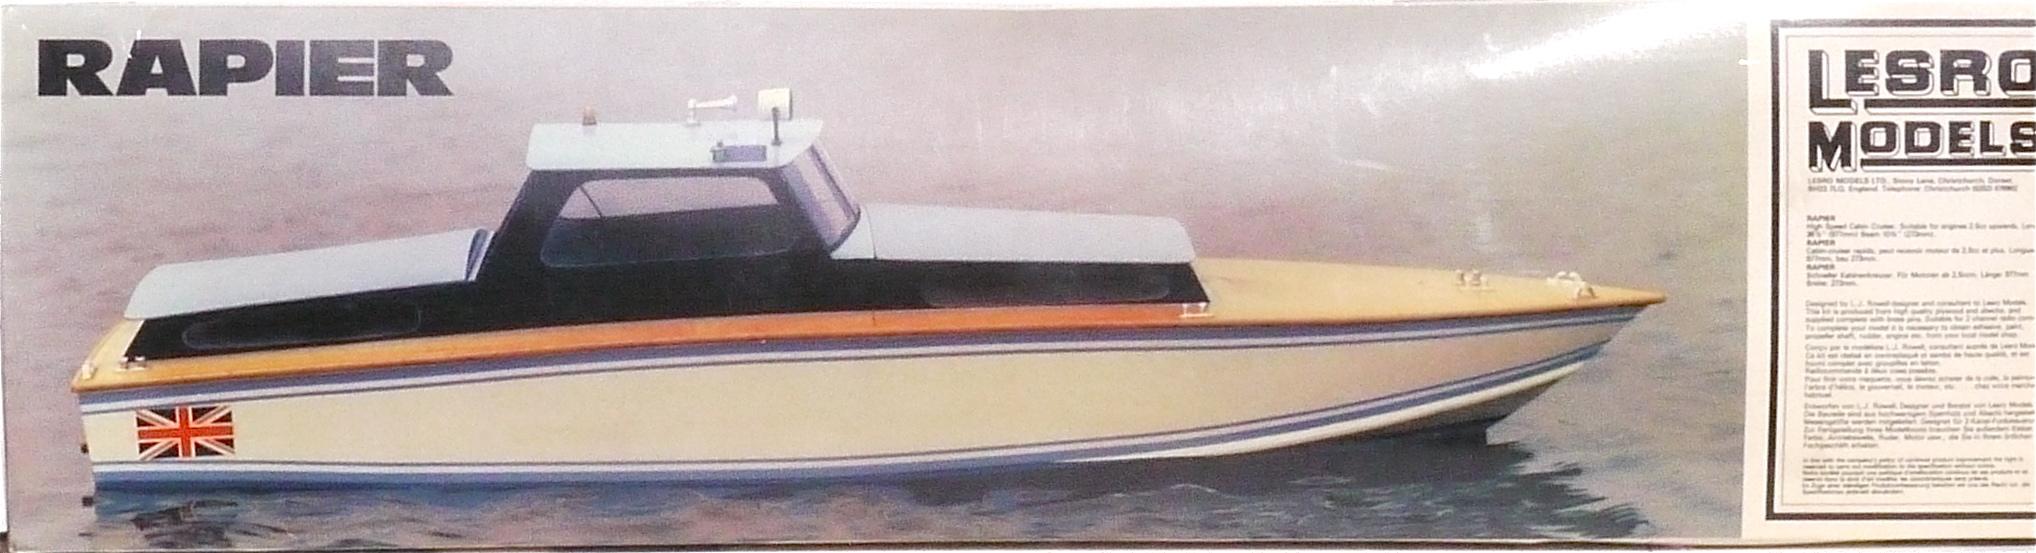 Lesro Models Rapier Cabin Cruiser Kit, including instructions and